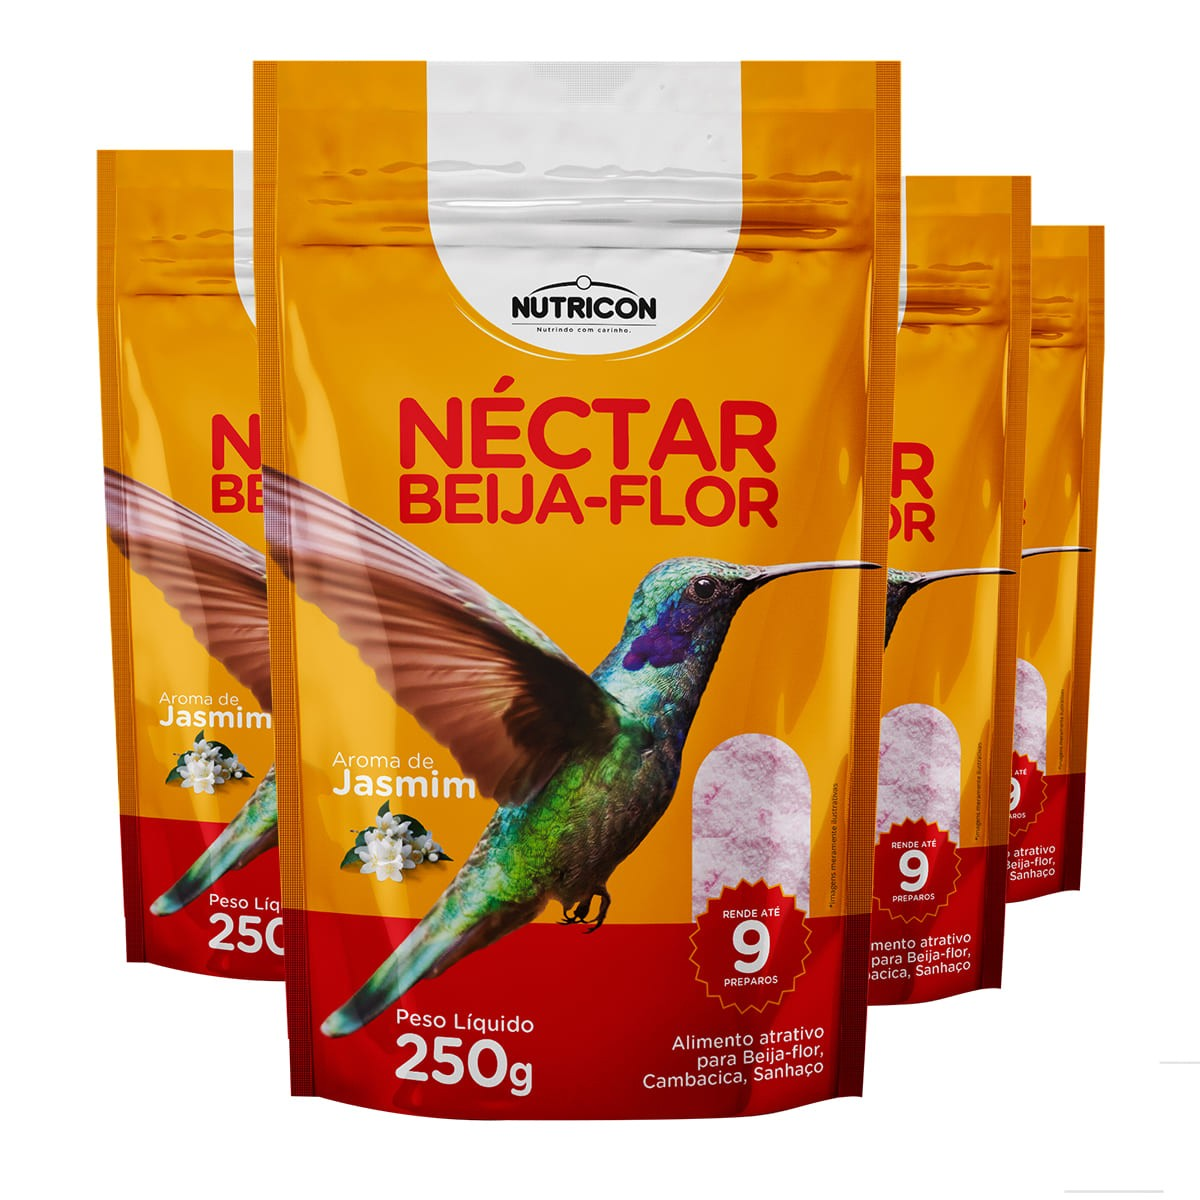 Nutricon Néctar para Beija-Flor 1kg - Alimento atrativo